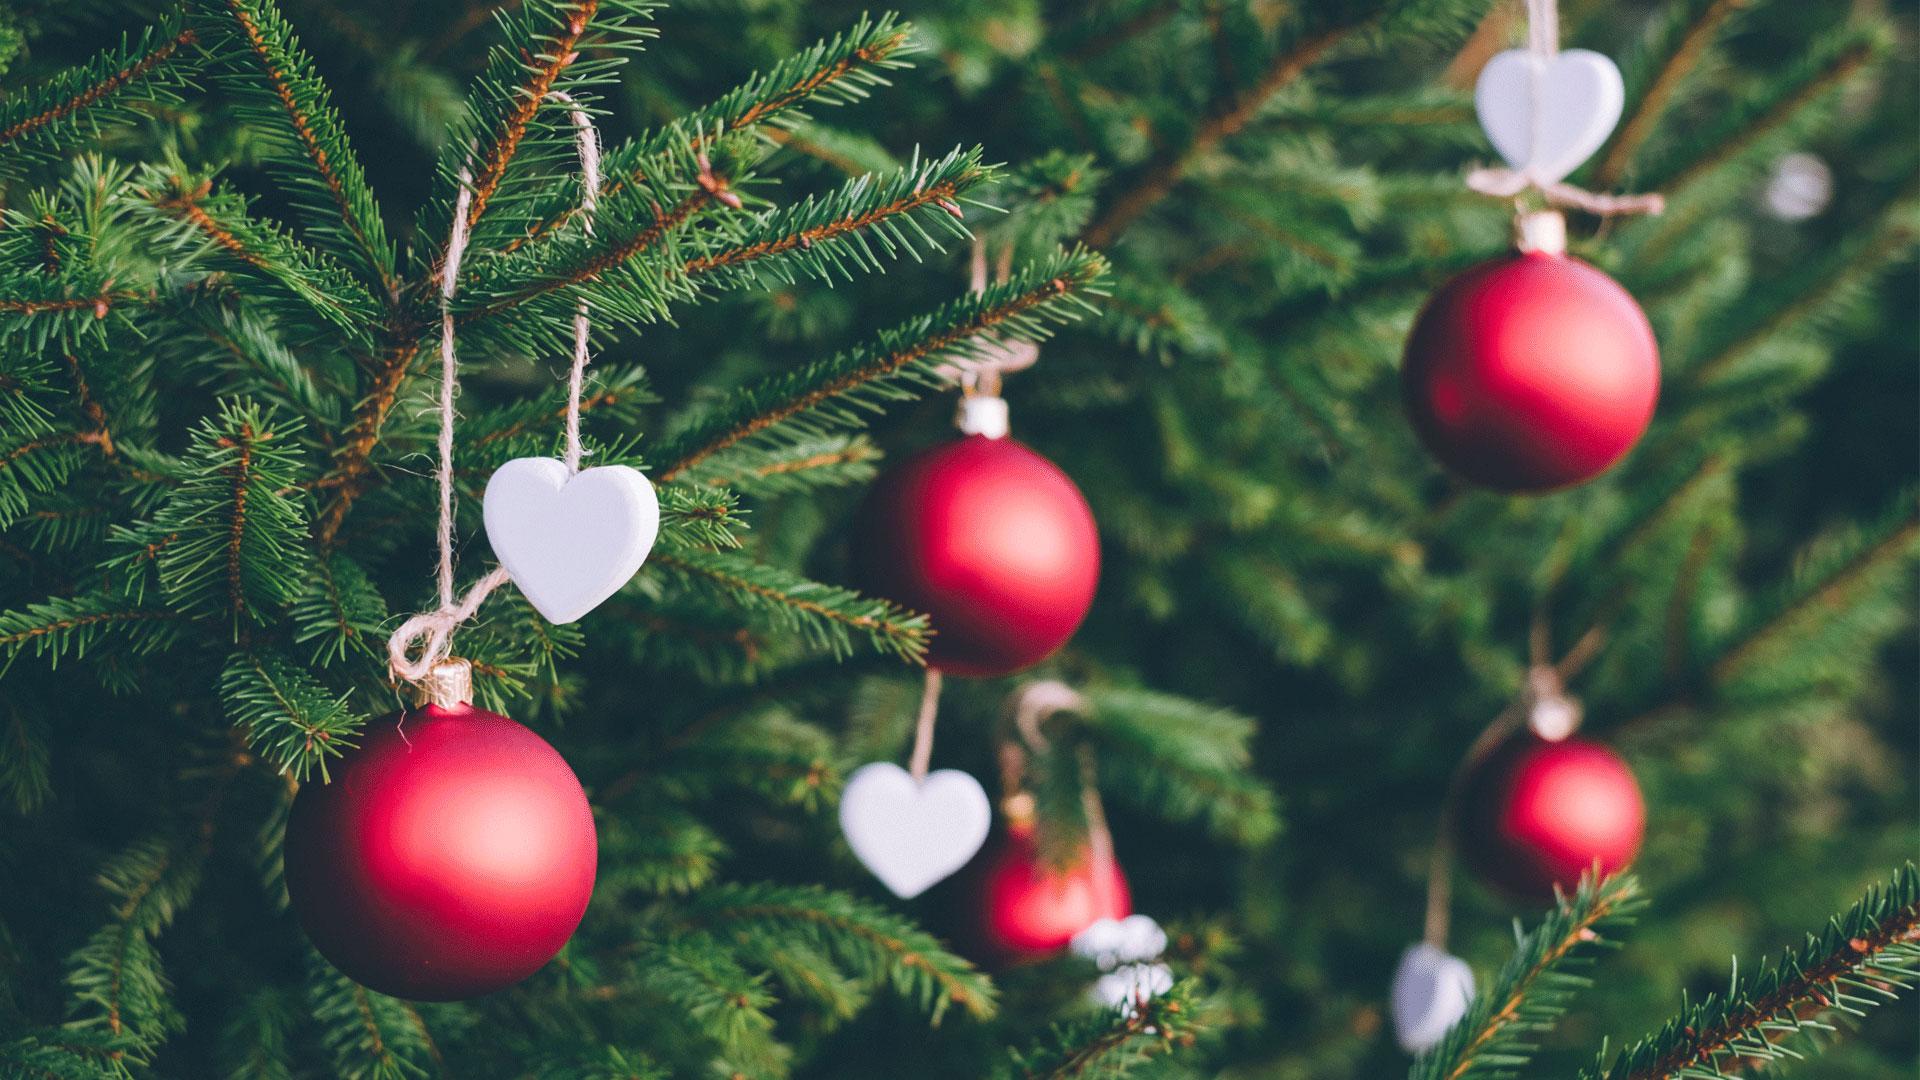 Christmas Wallpaper Tree Decoration